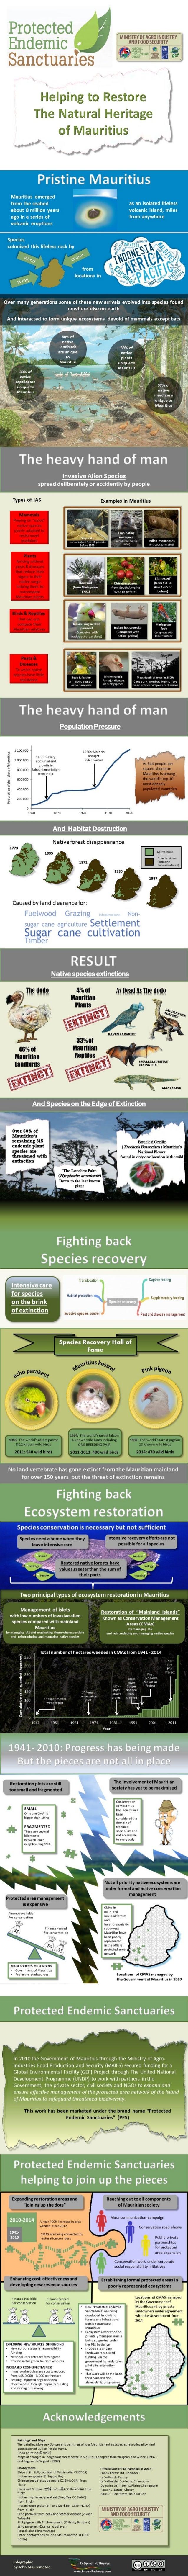 Infographic byJohnMauremotoo